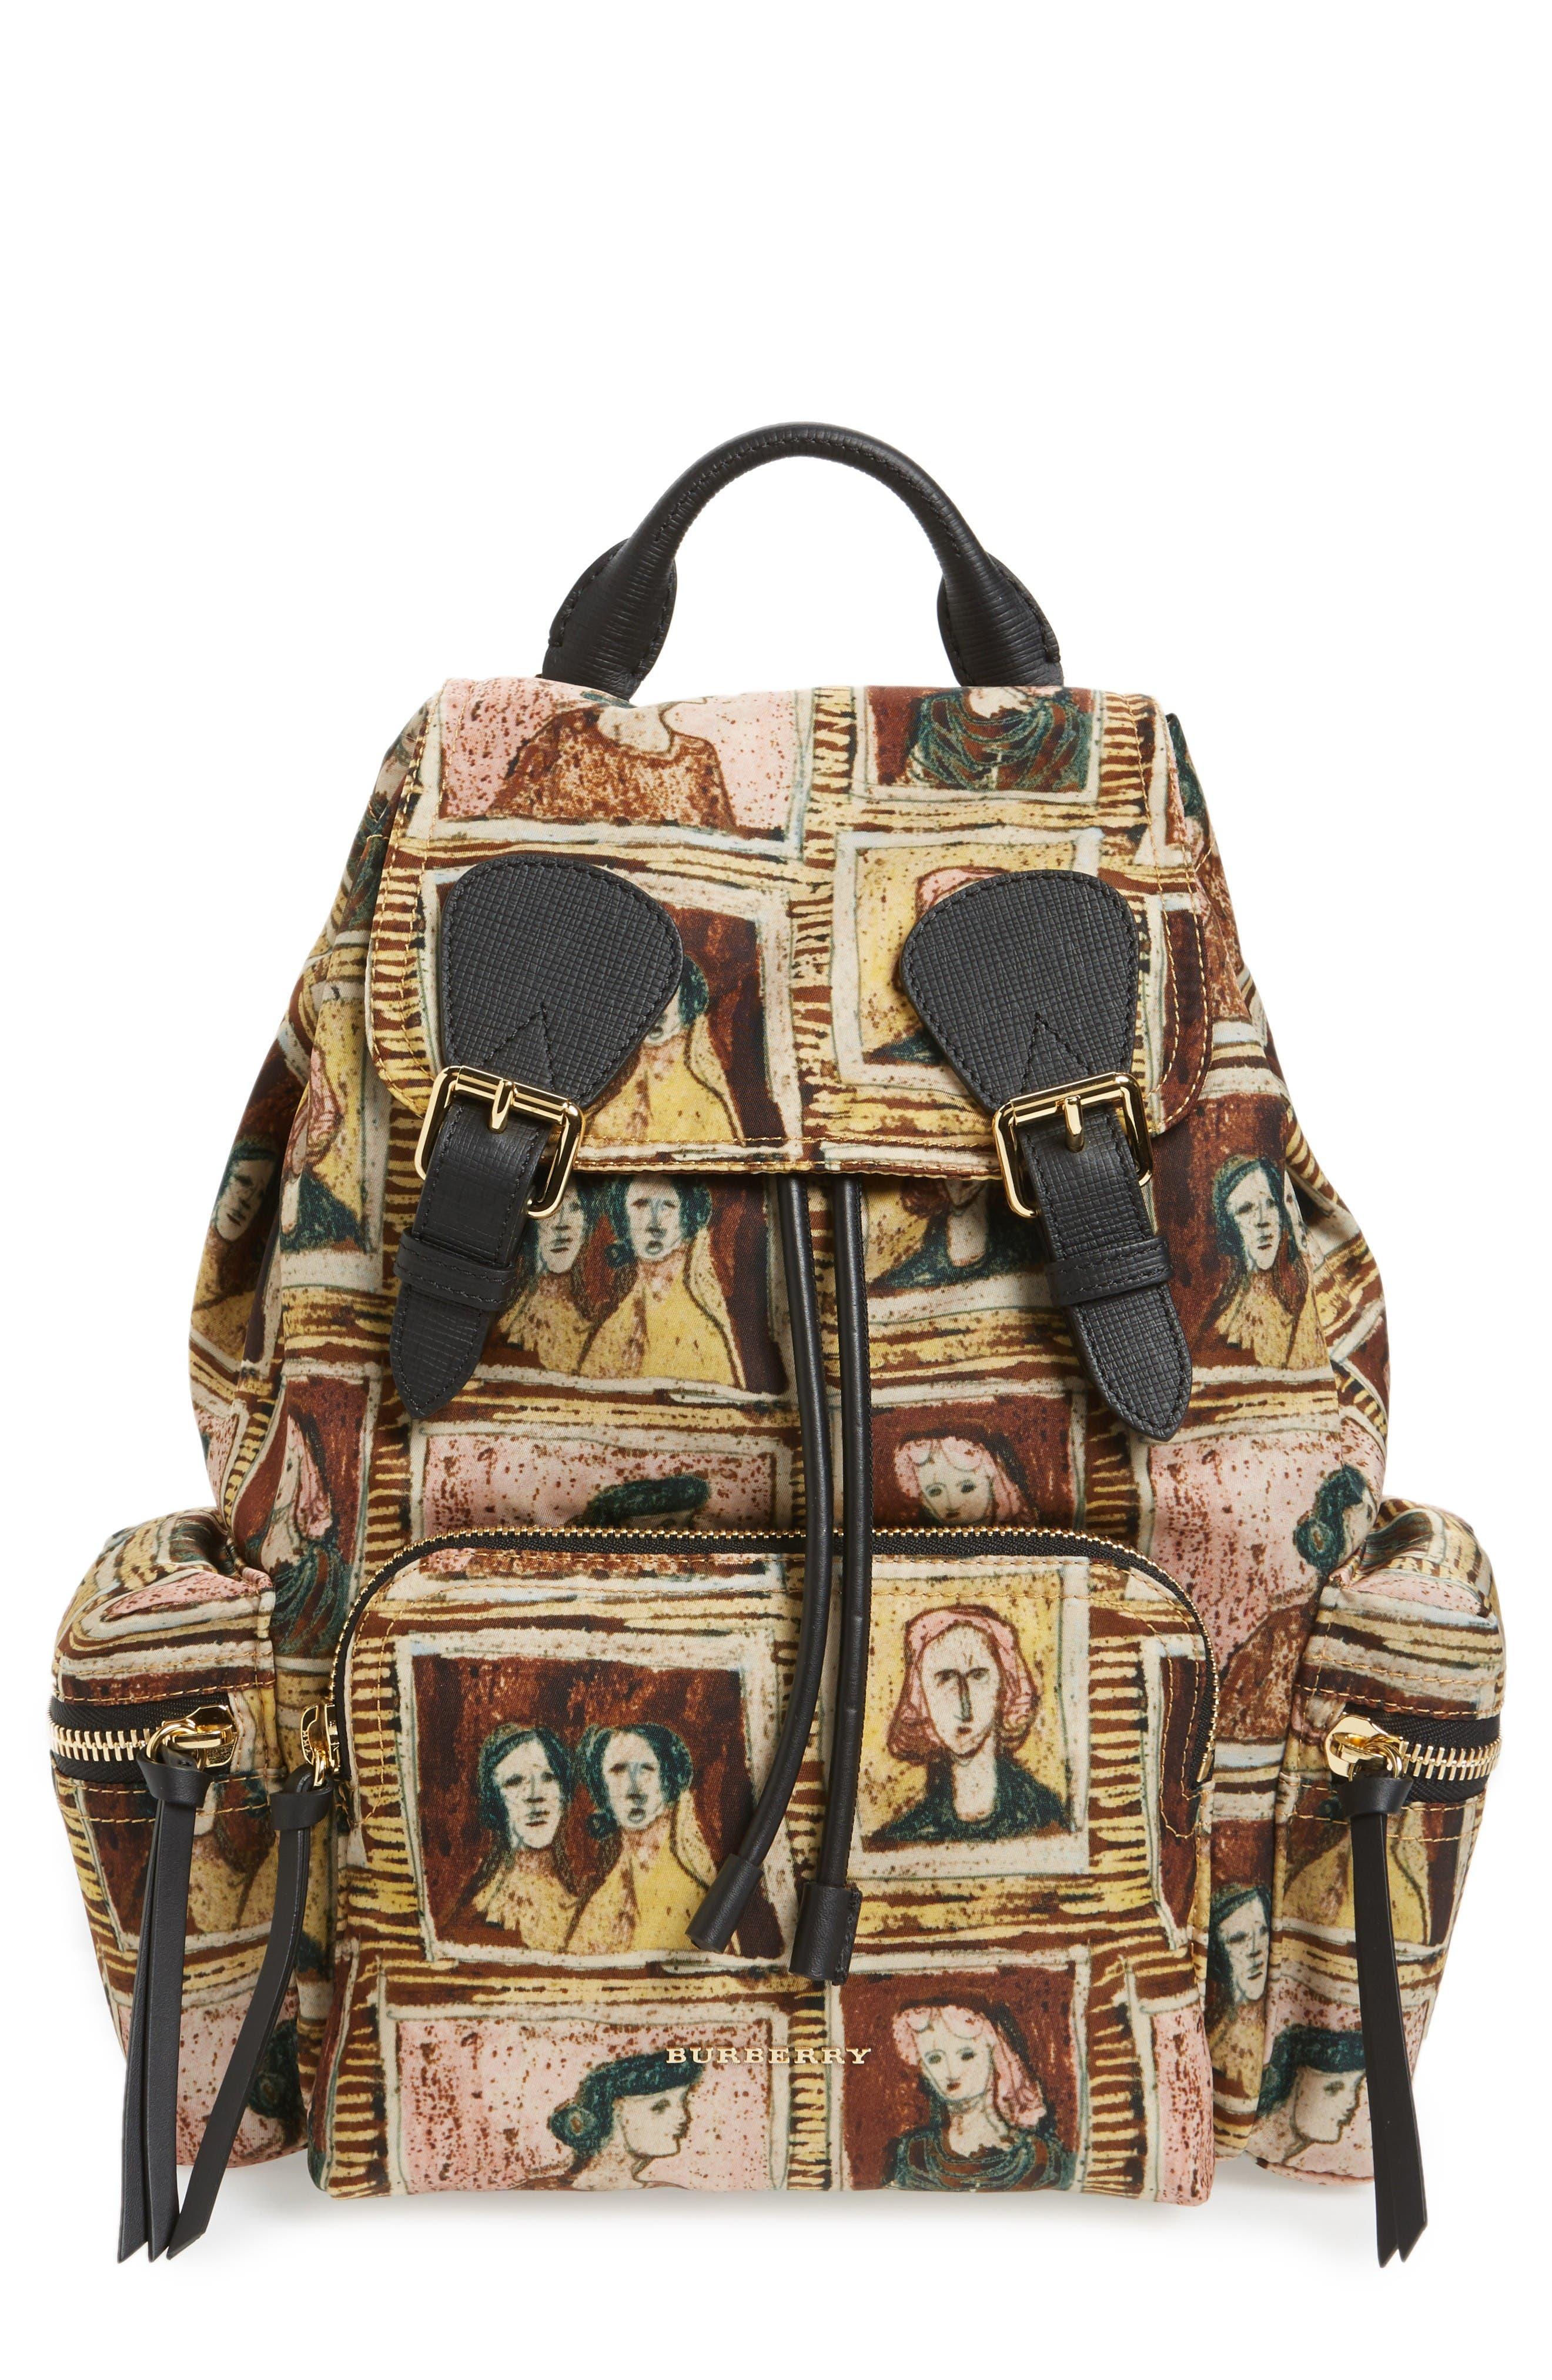 Medium Henrey Backpack,                         Main,                         color, Umber Brown Multi